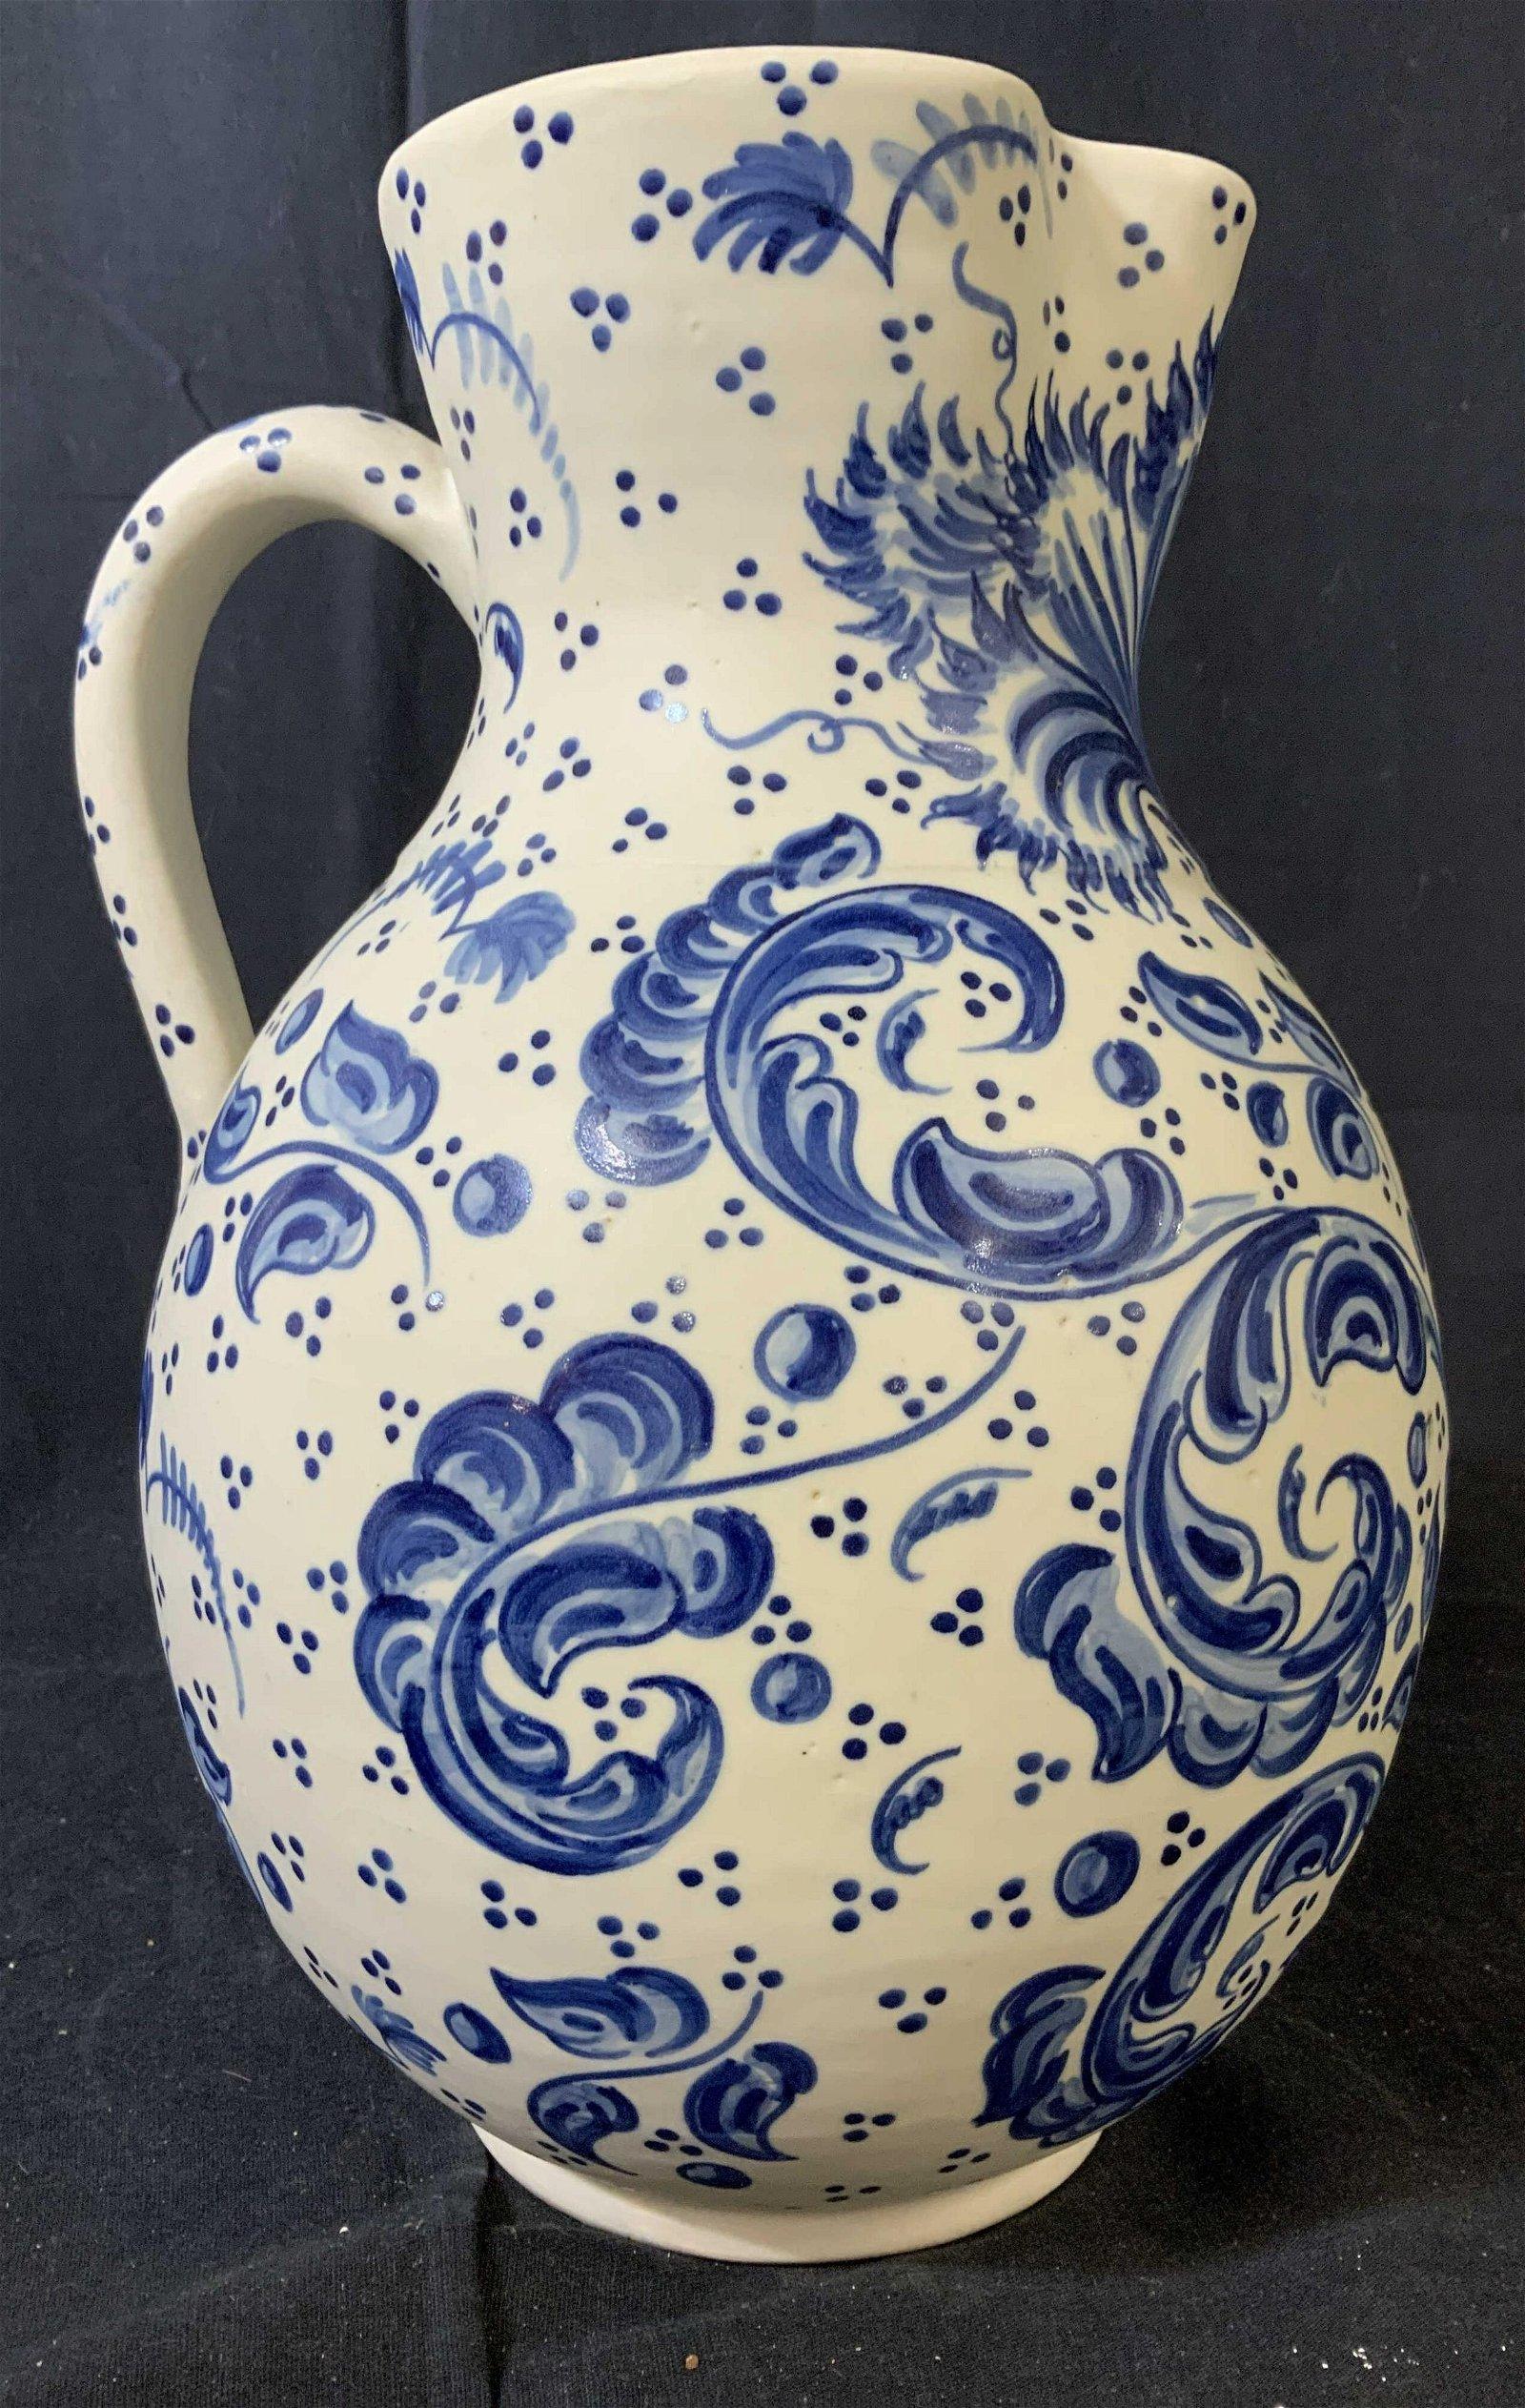 Blue White Ceramic Pitcher, Spain